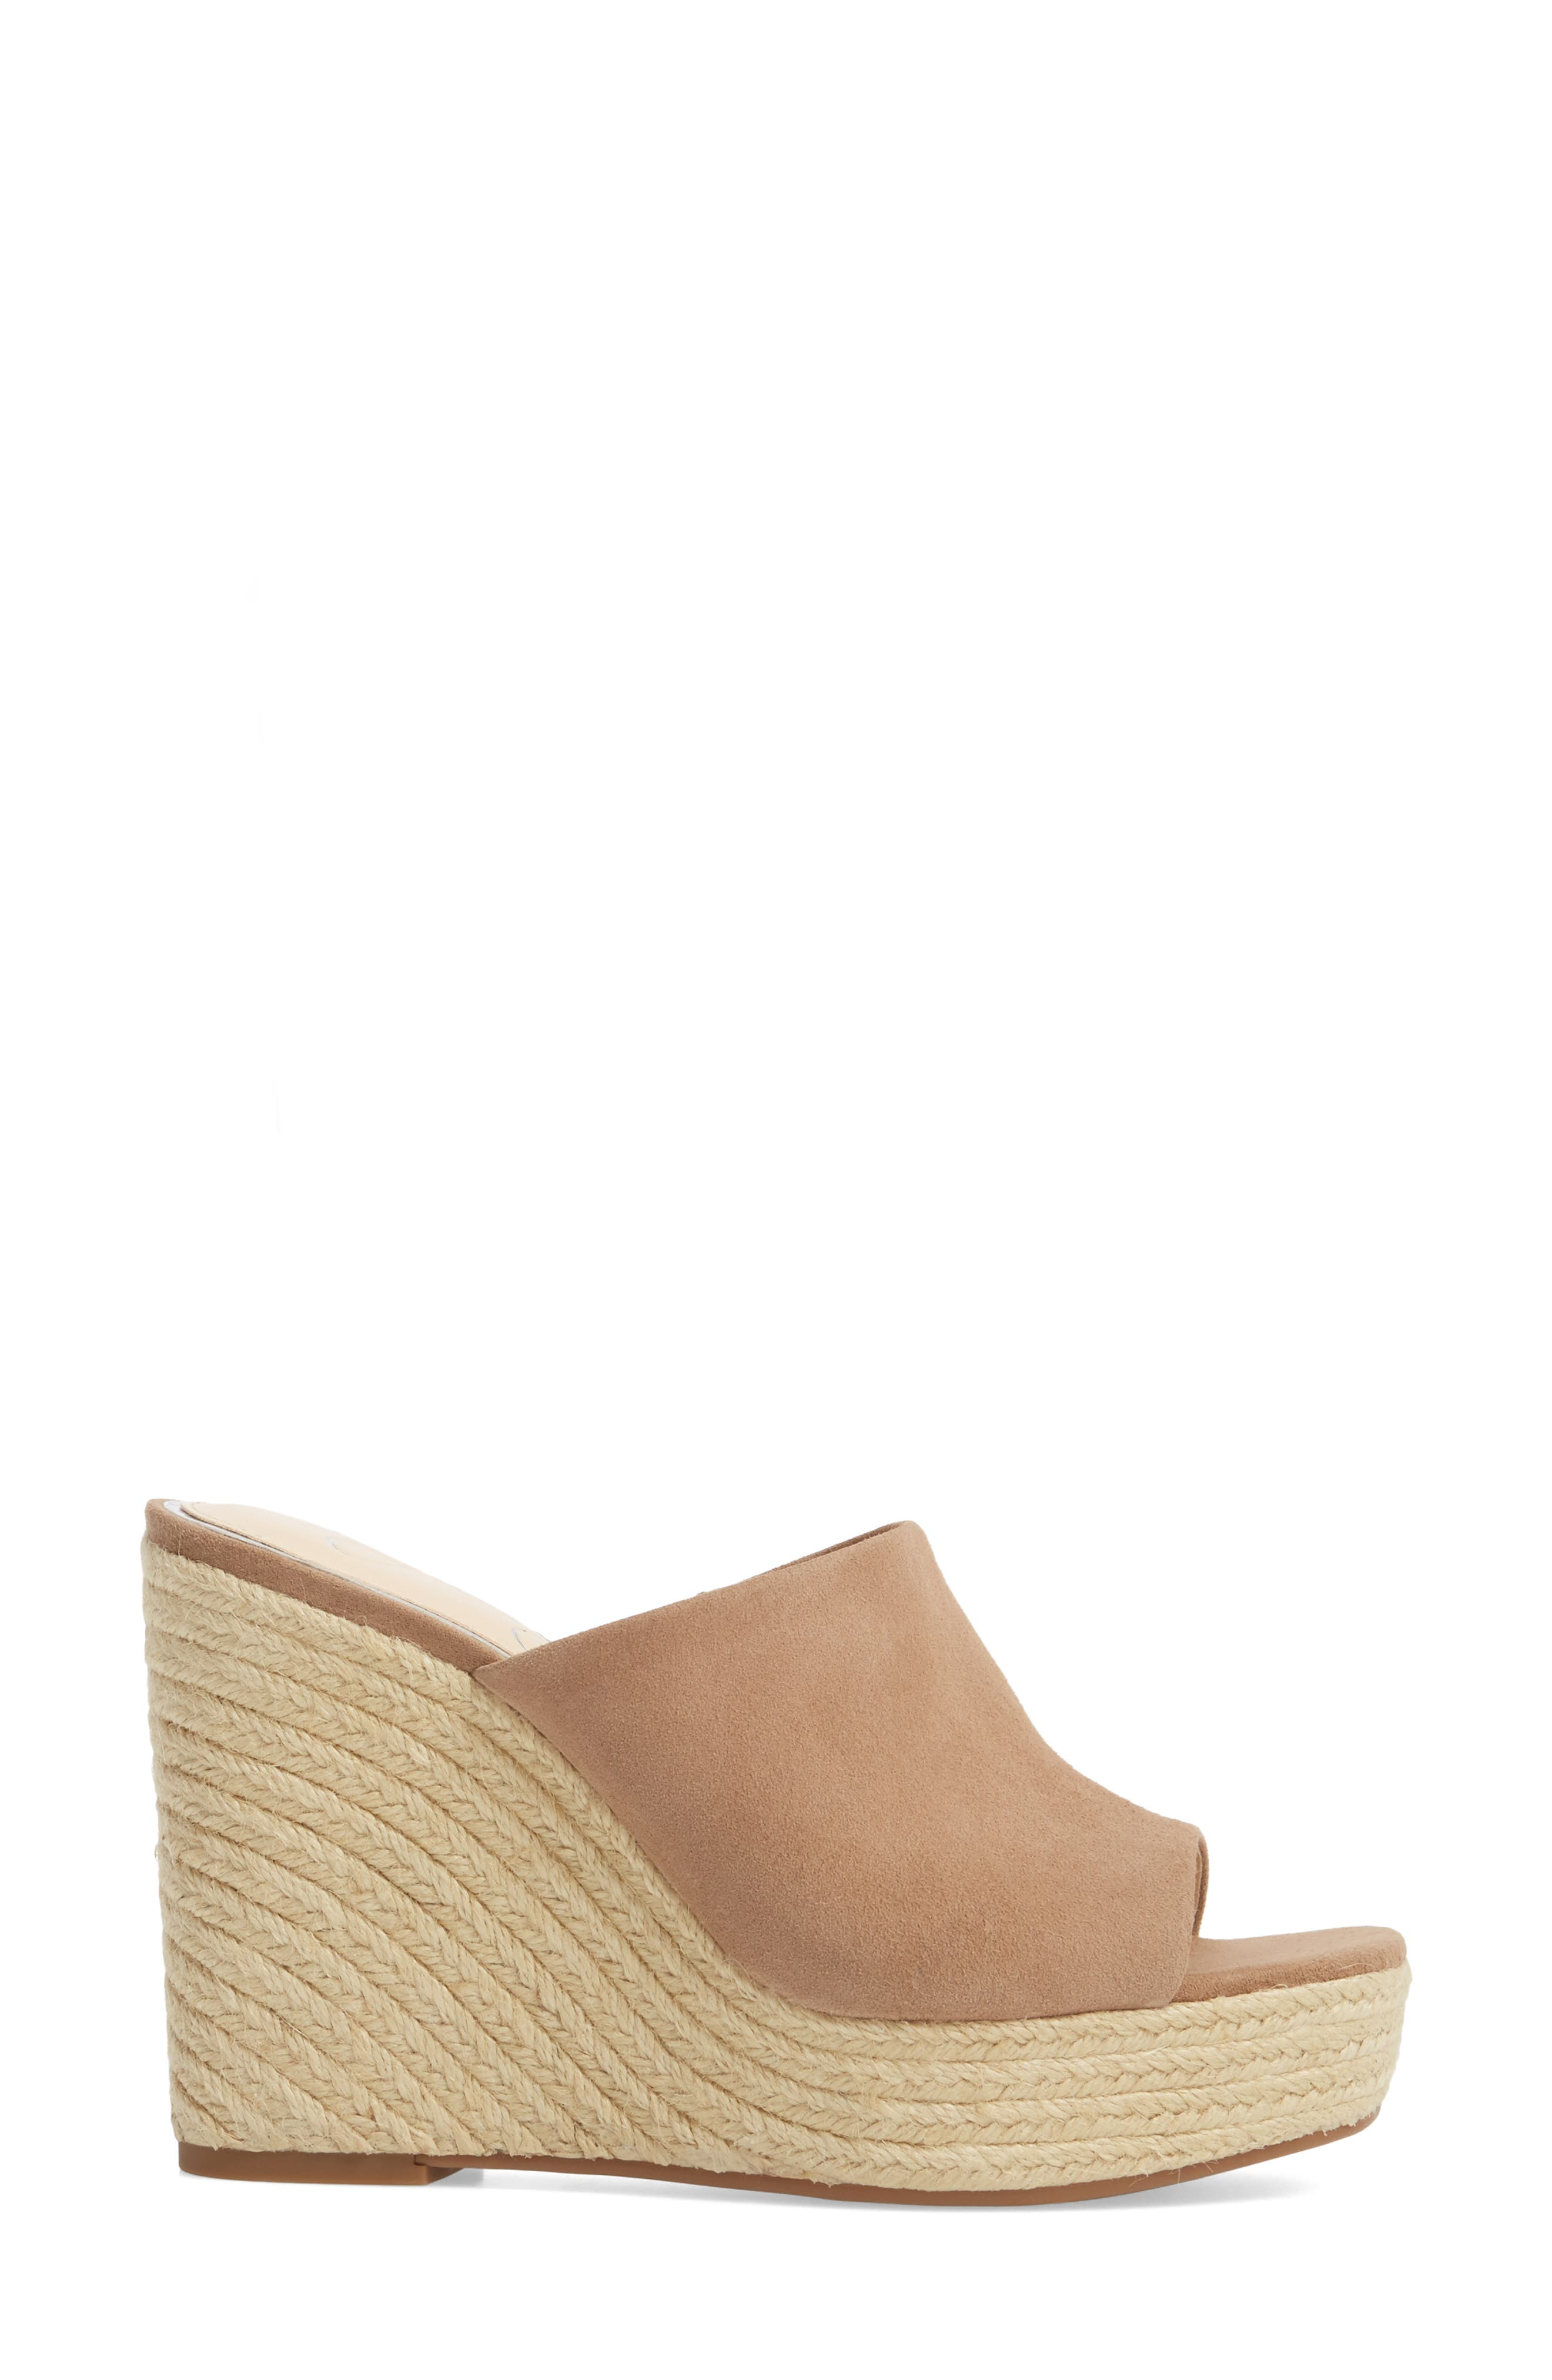 Sirella Platform Wedge Slide Sandal,                             Alternate thumbnail 8, color,